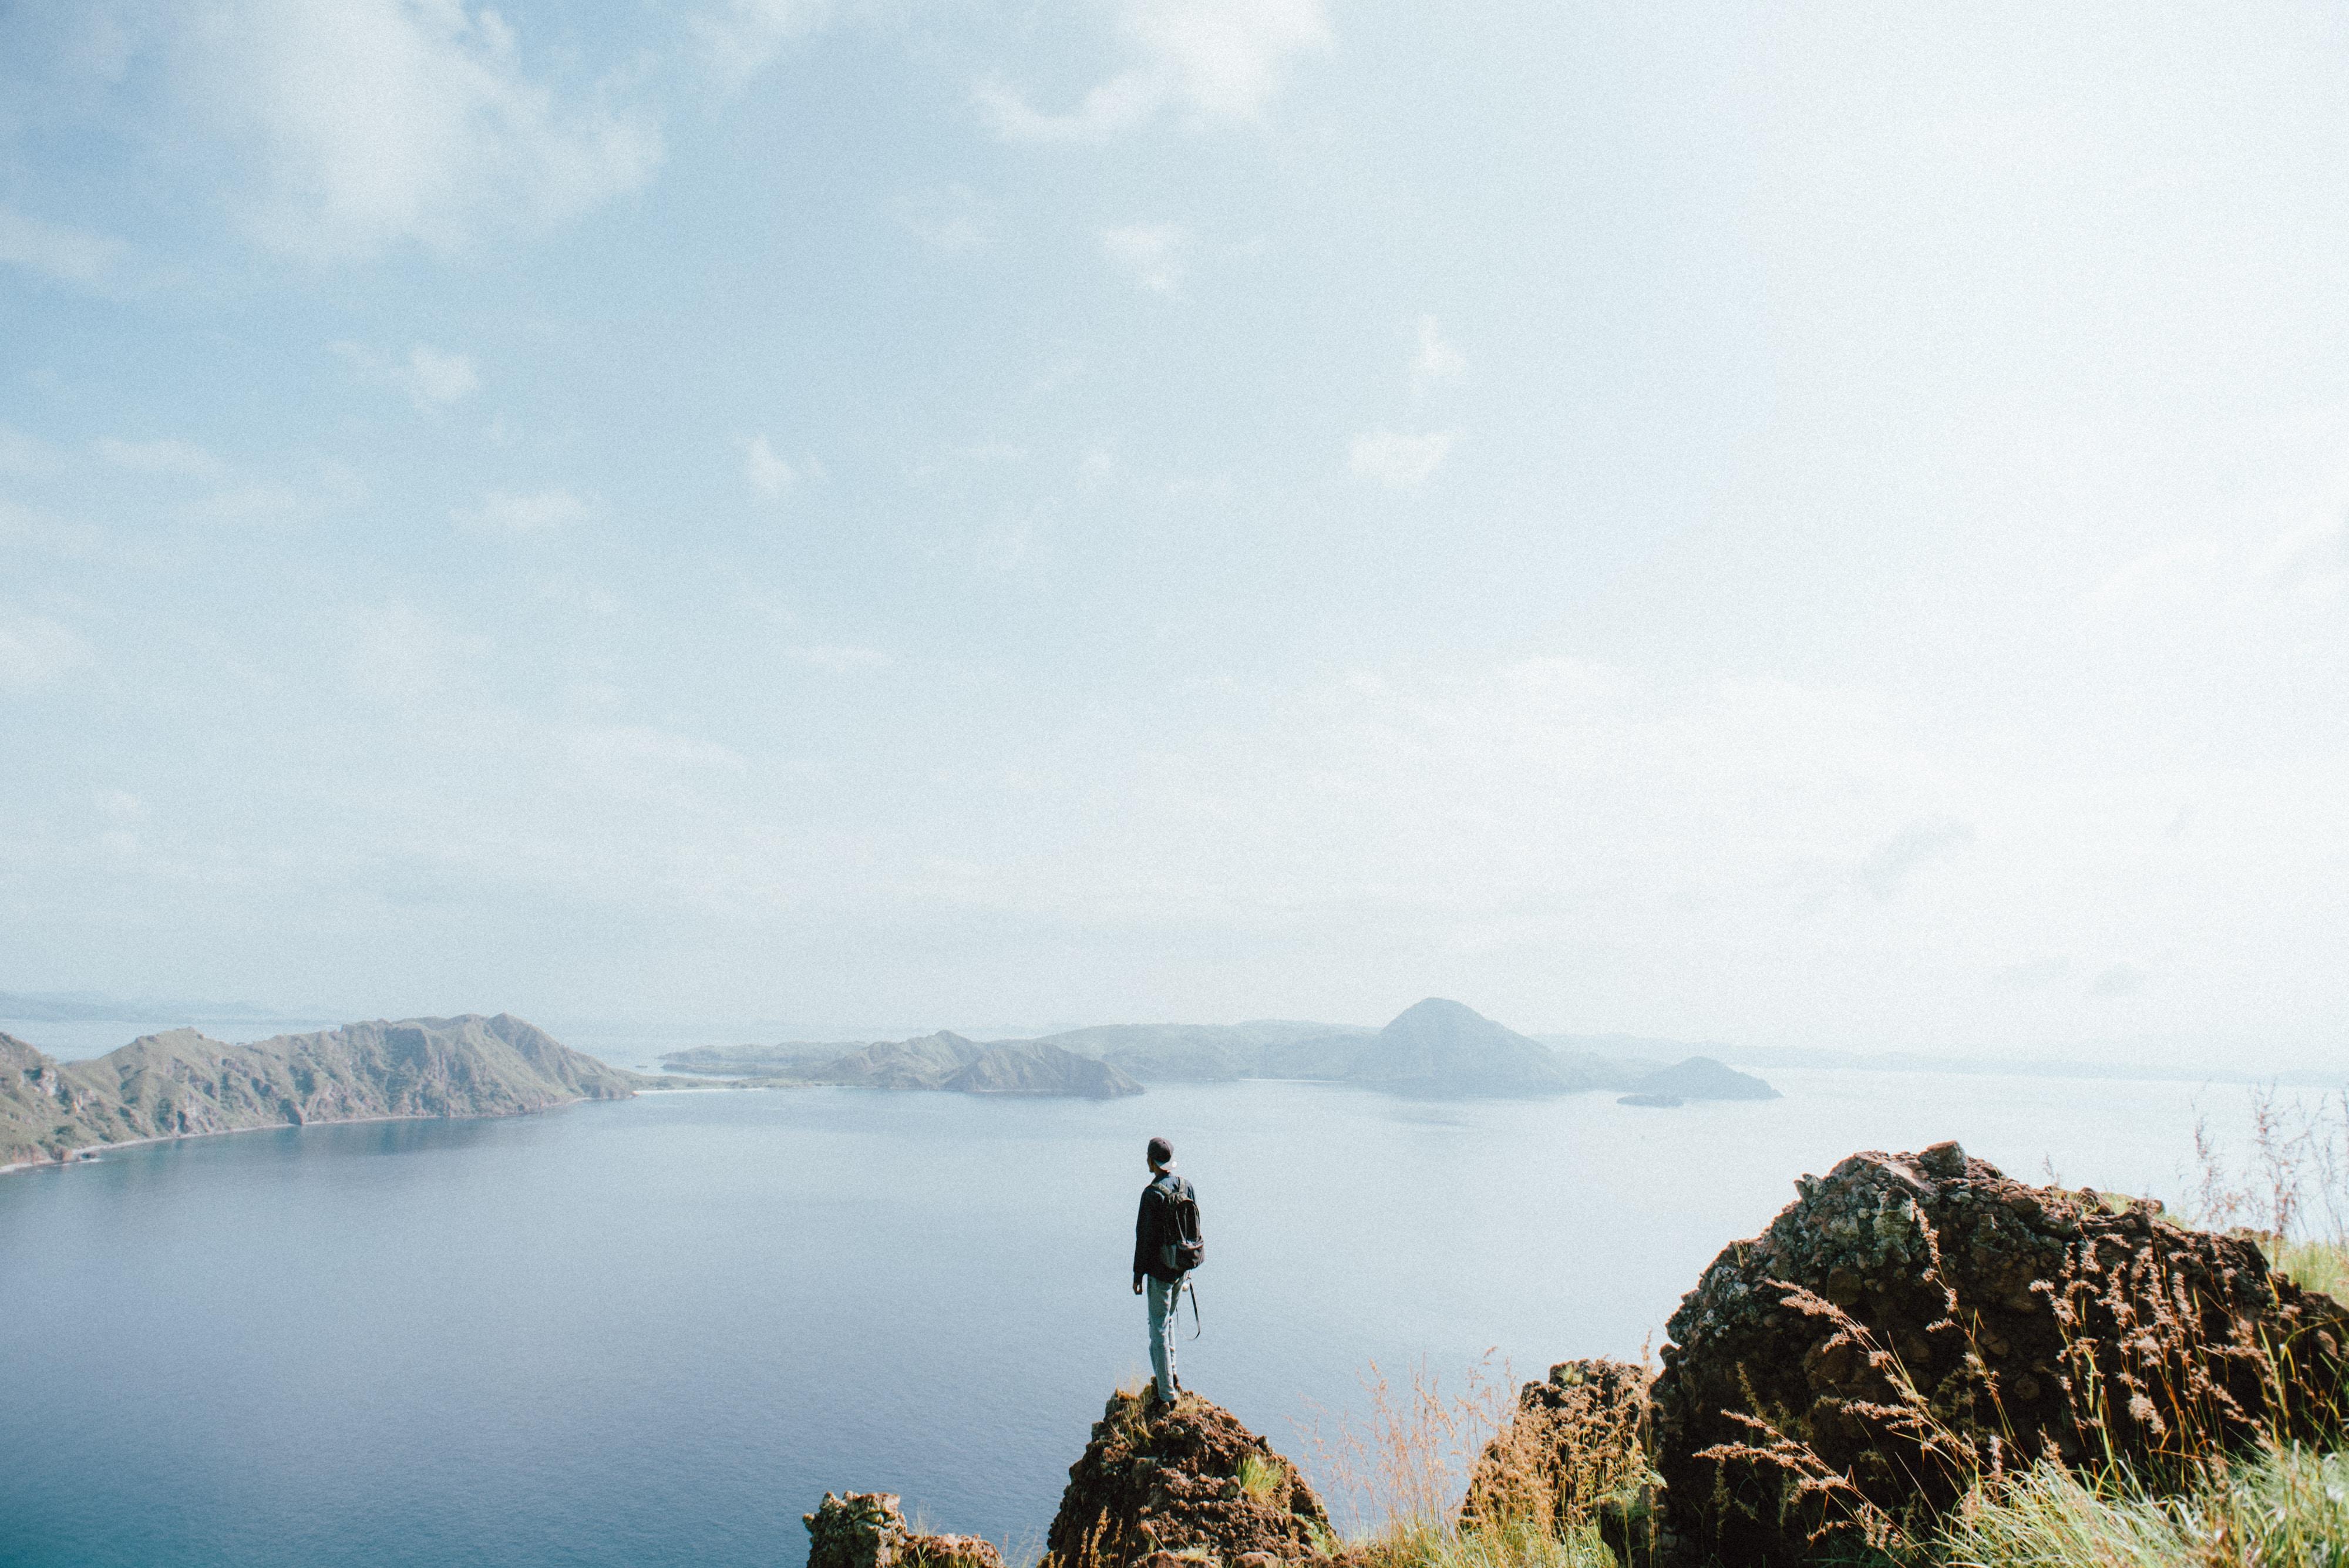 man standing on brown stone during daytime